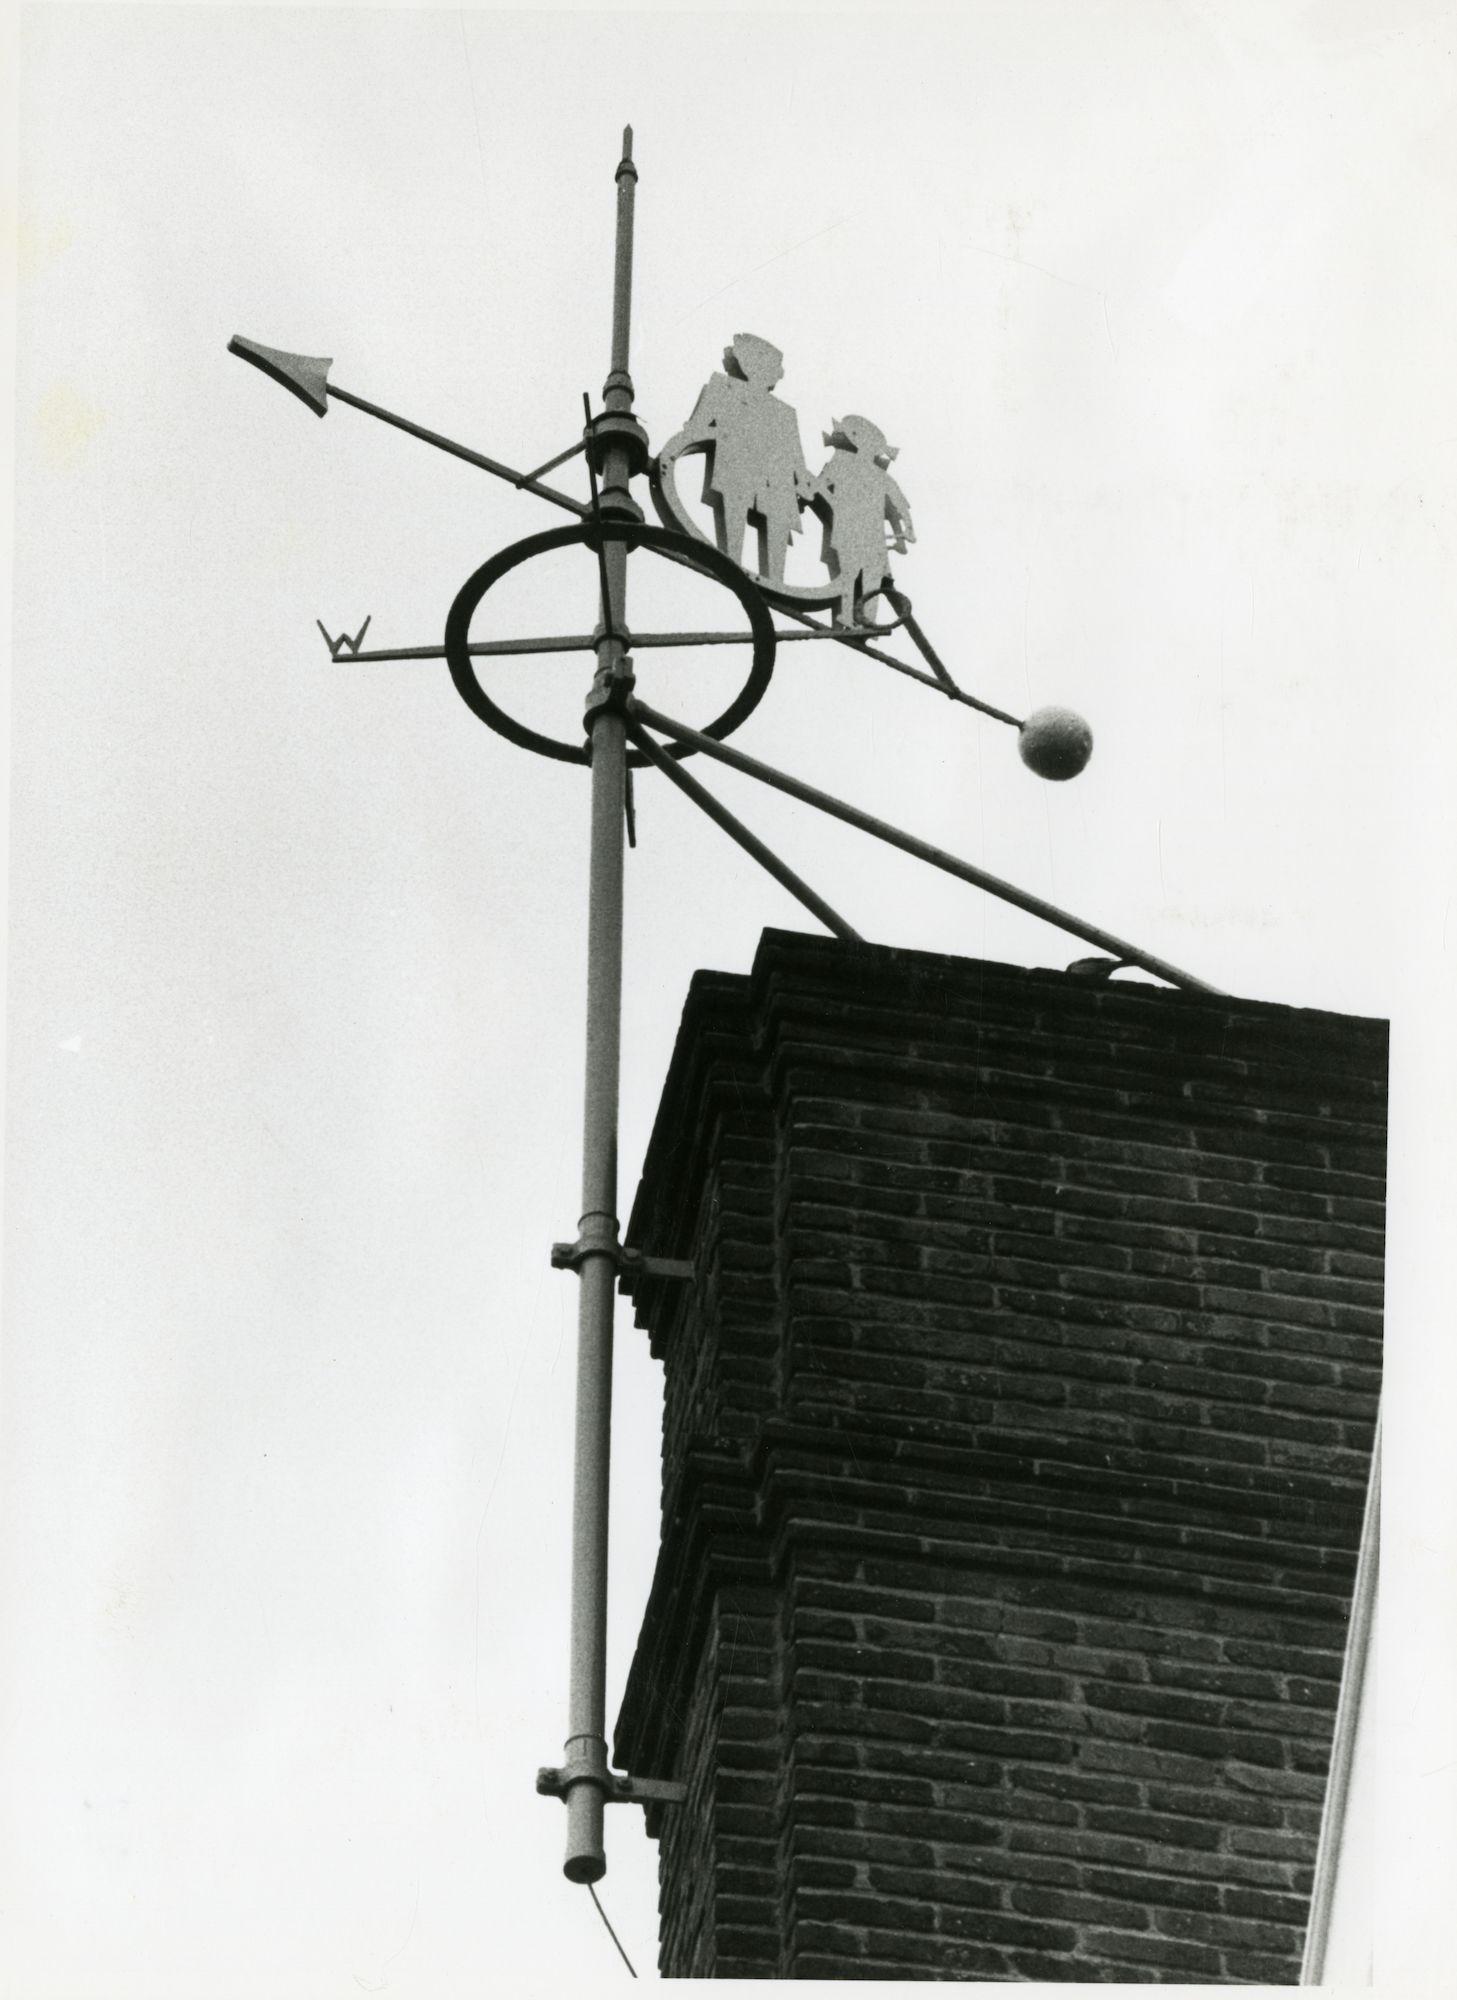 Gent: Malem: Windwijzer, 1979